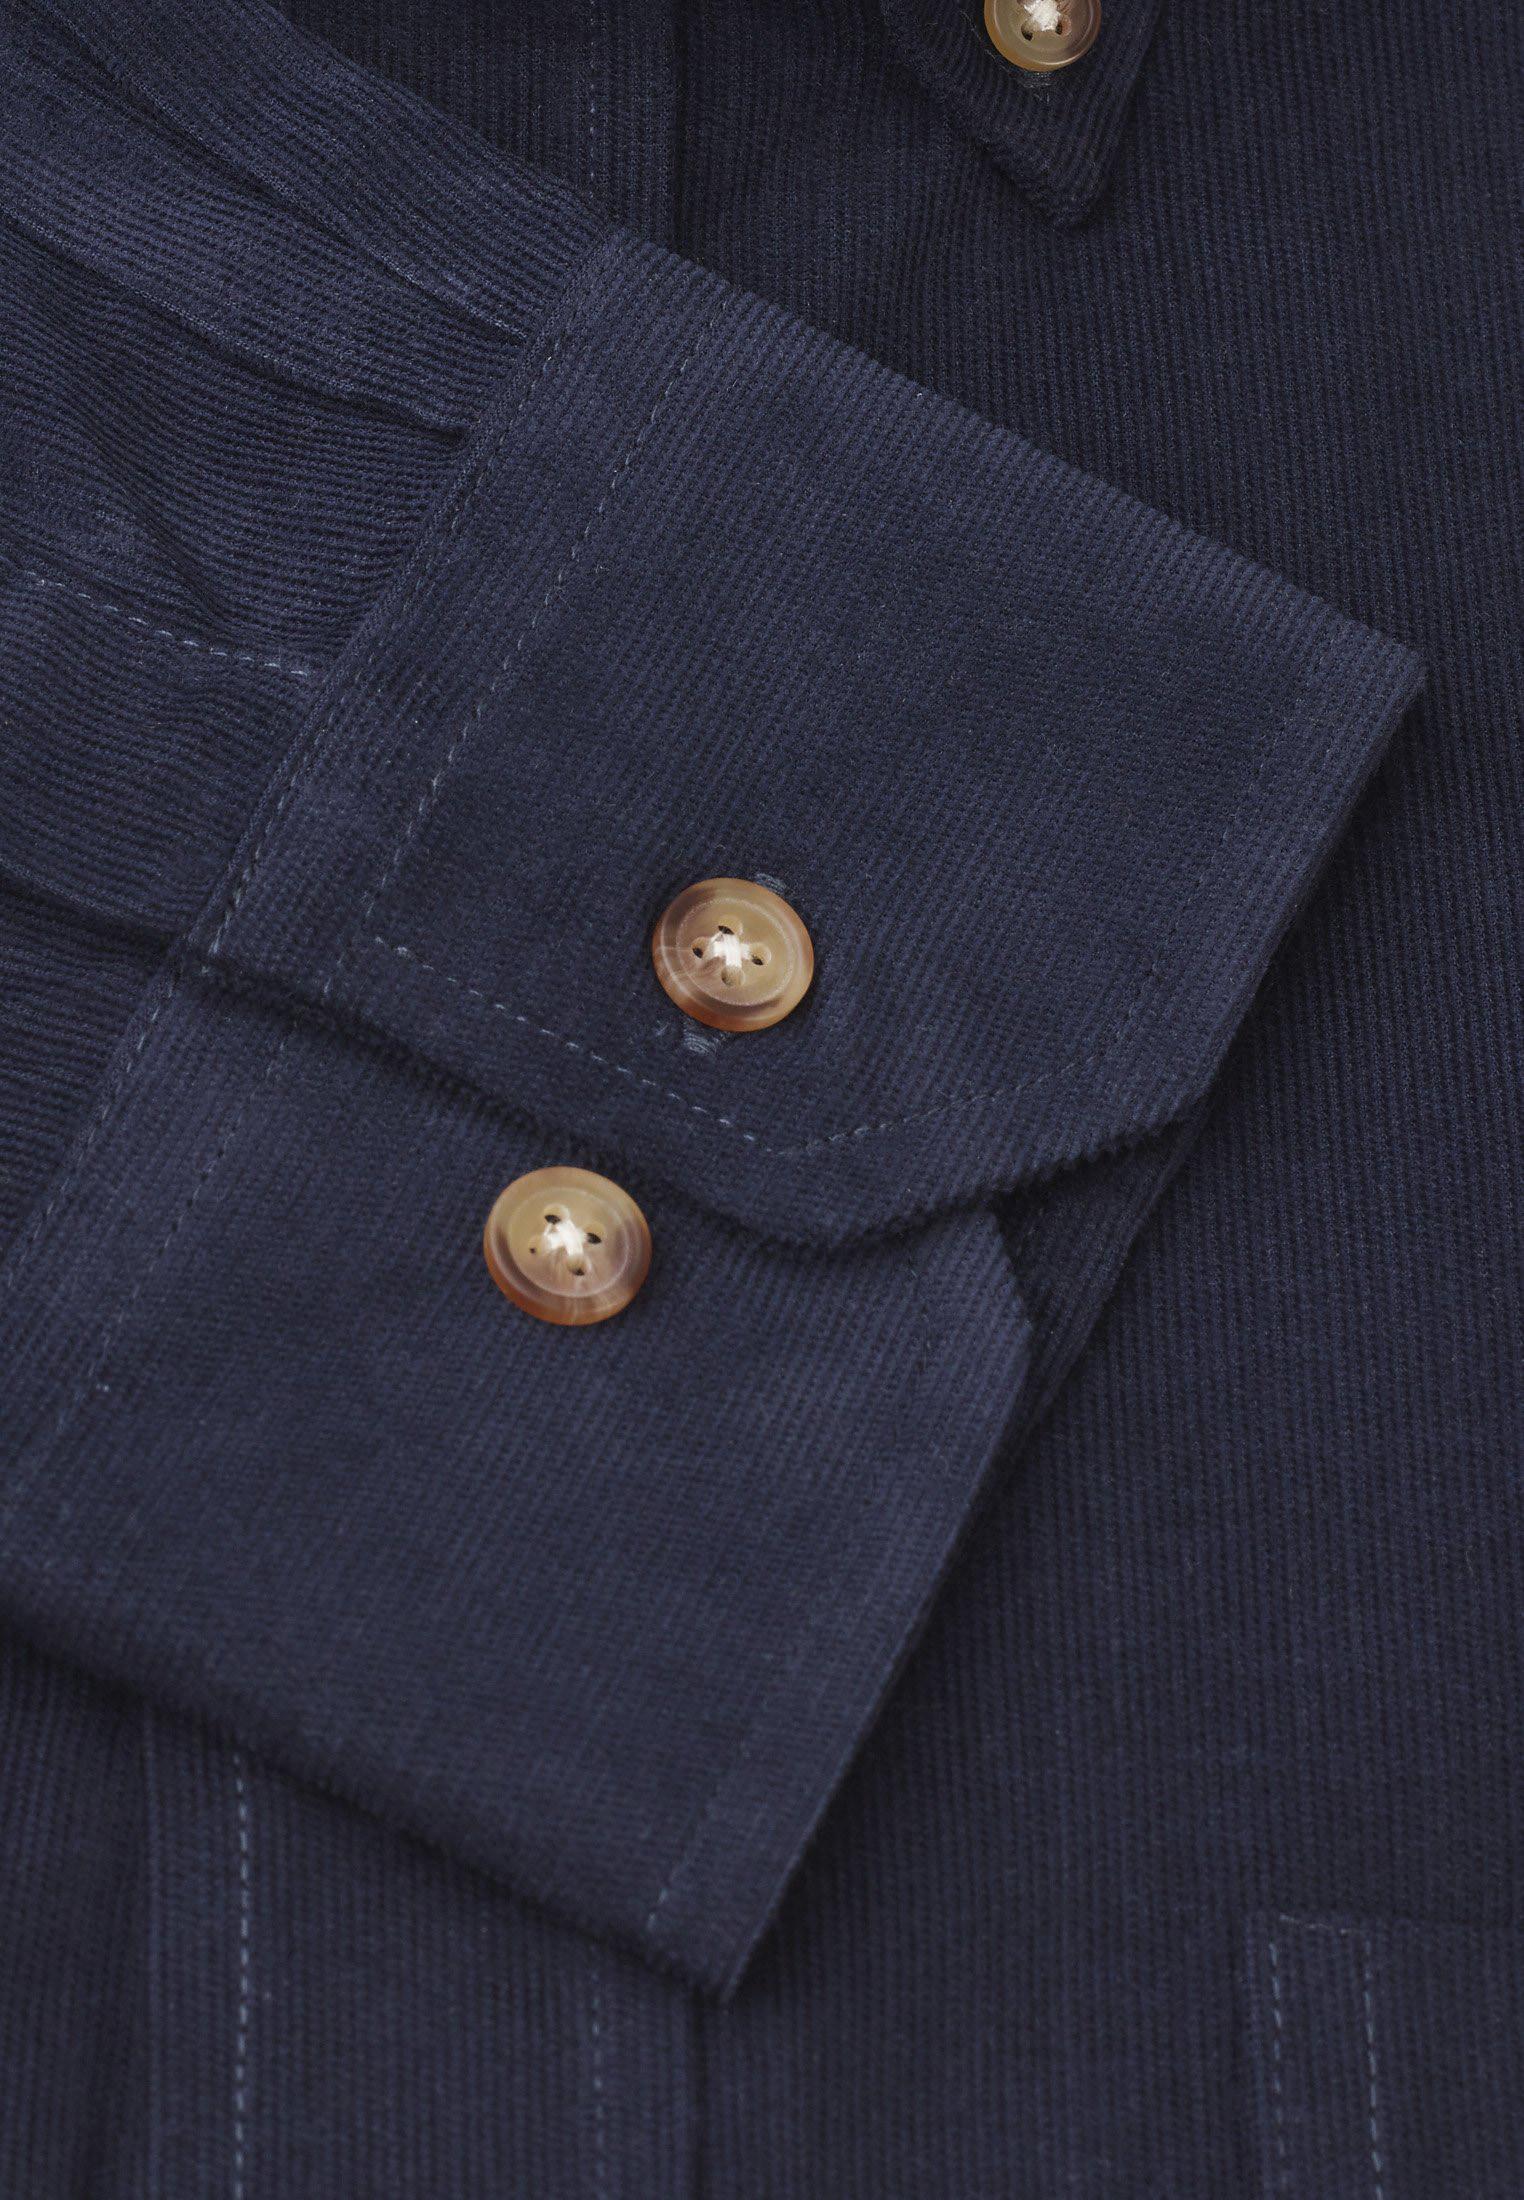 Navy Fine Needle Cord Shirt